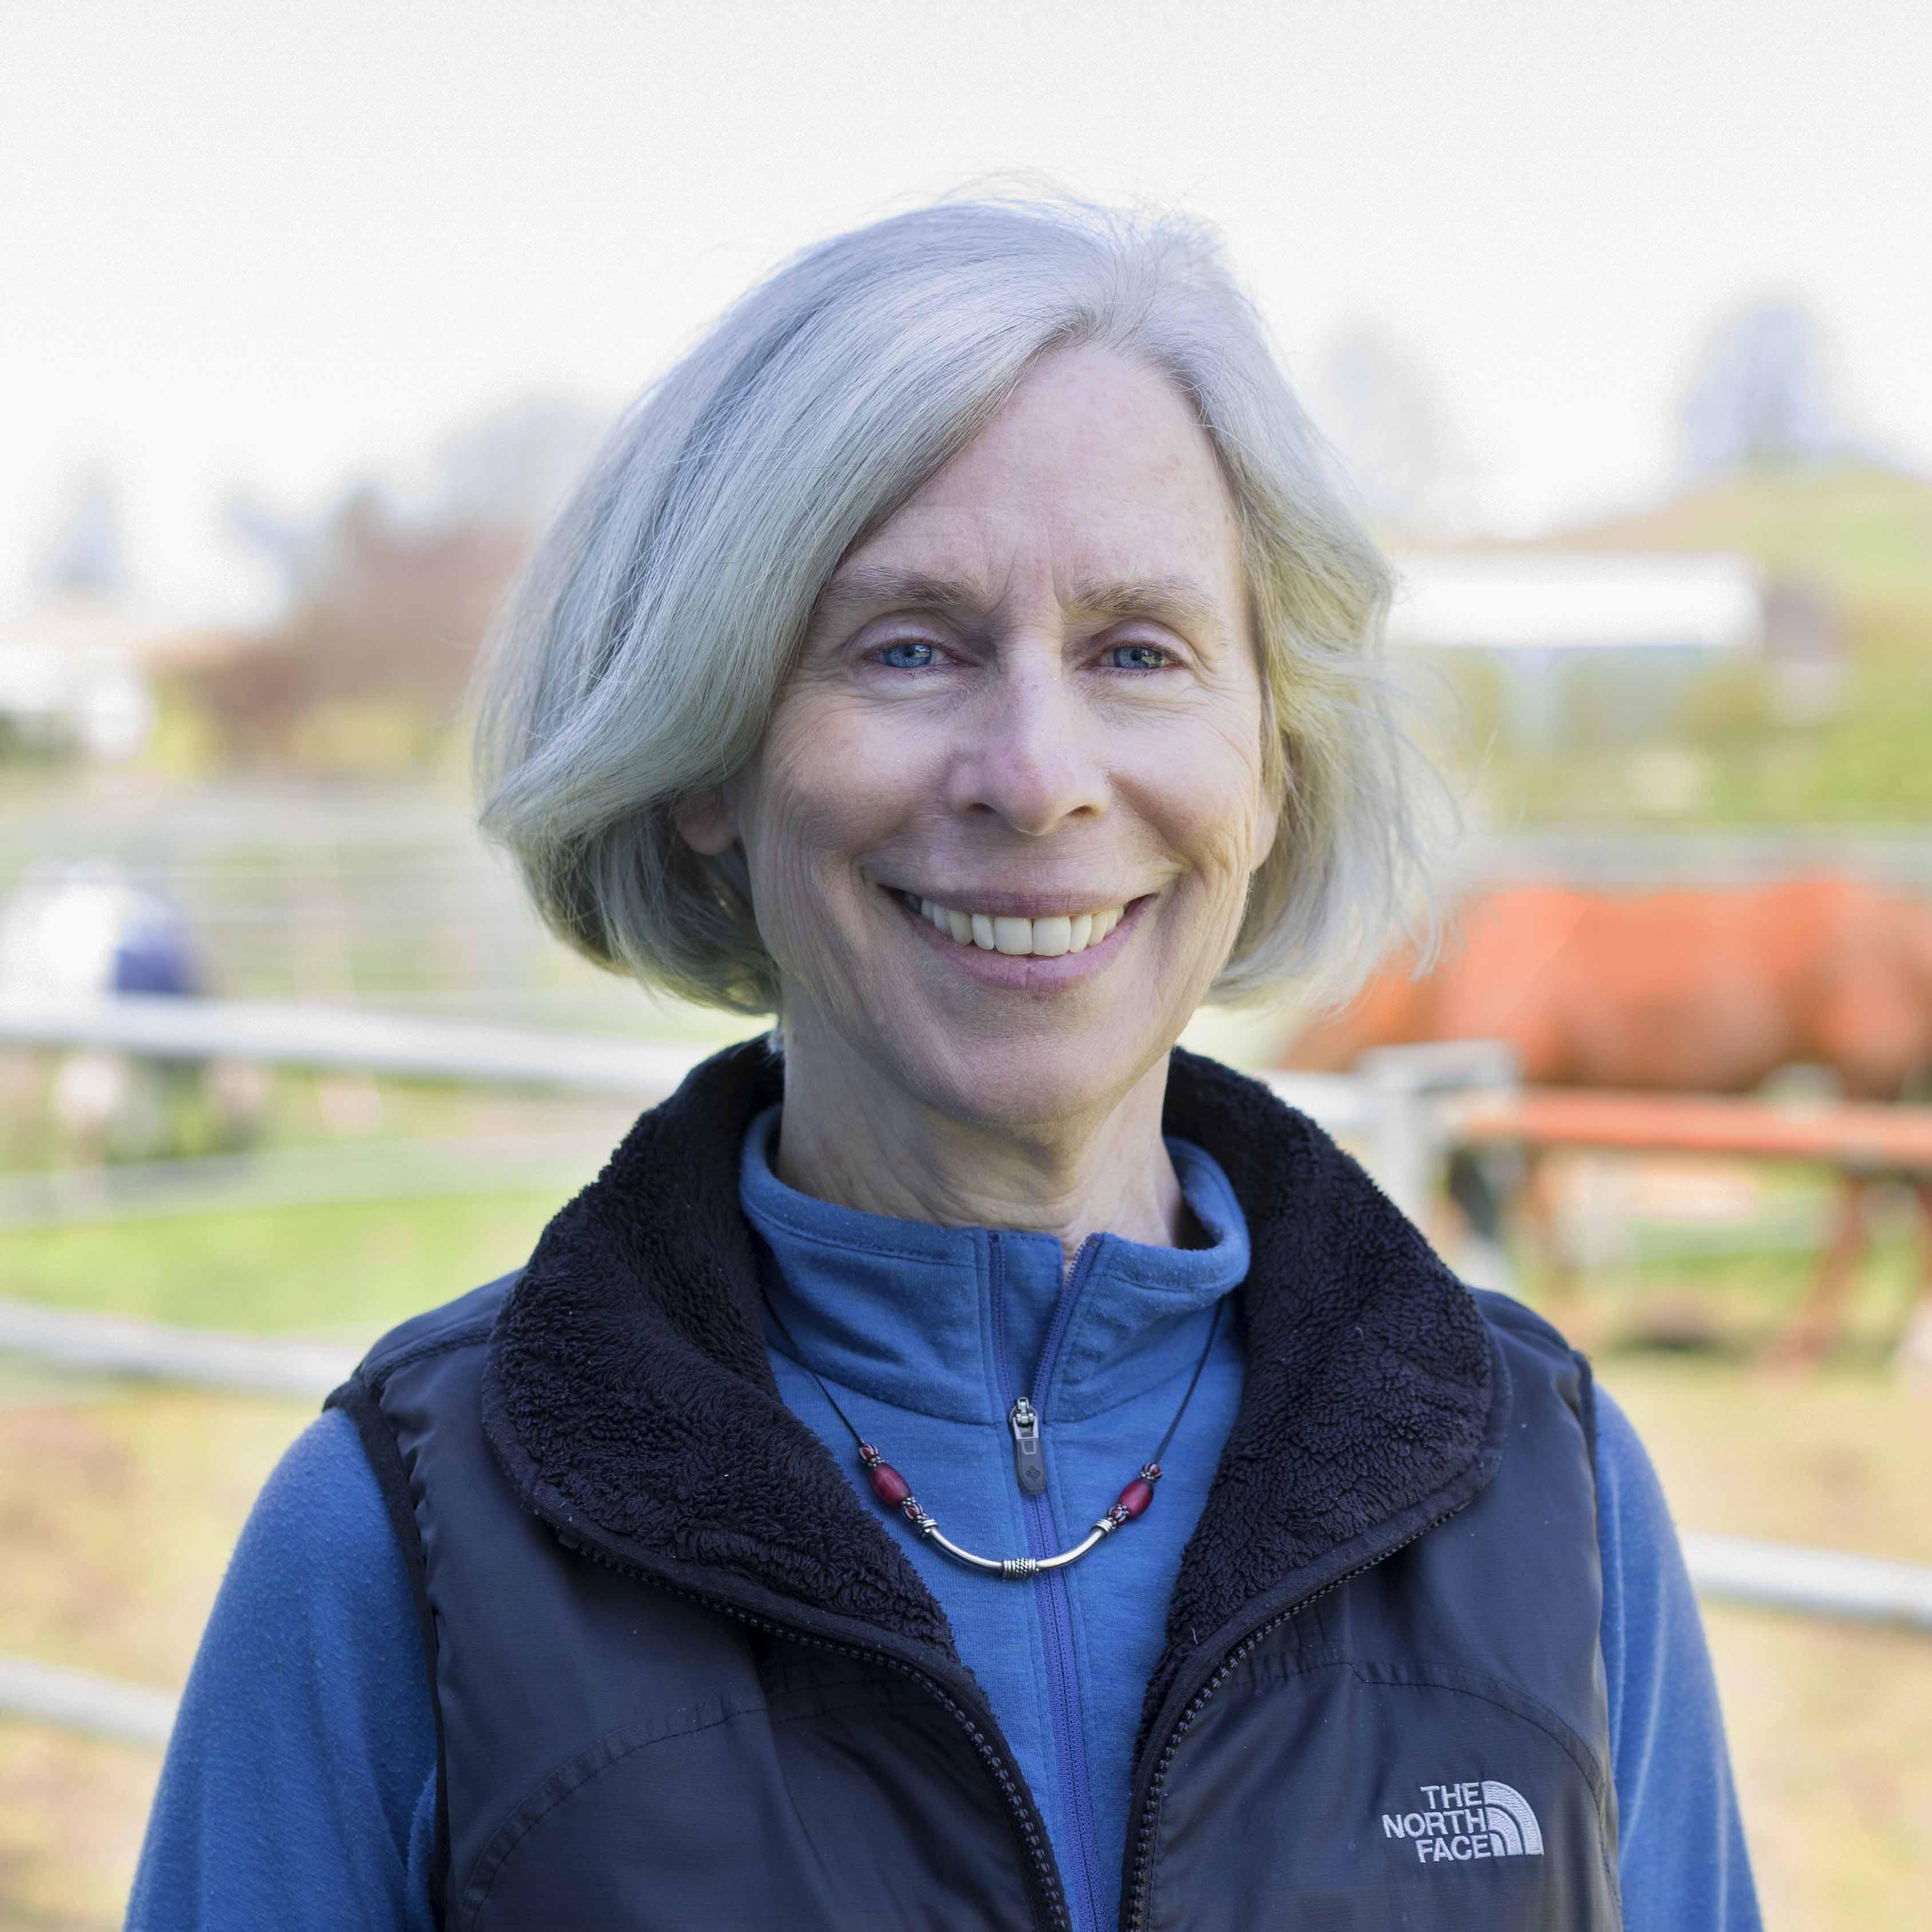 Photo of Mary Ellen Englert